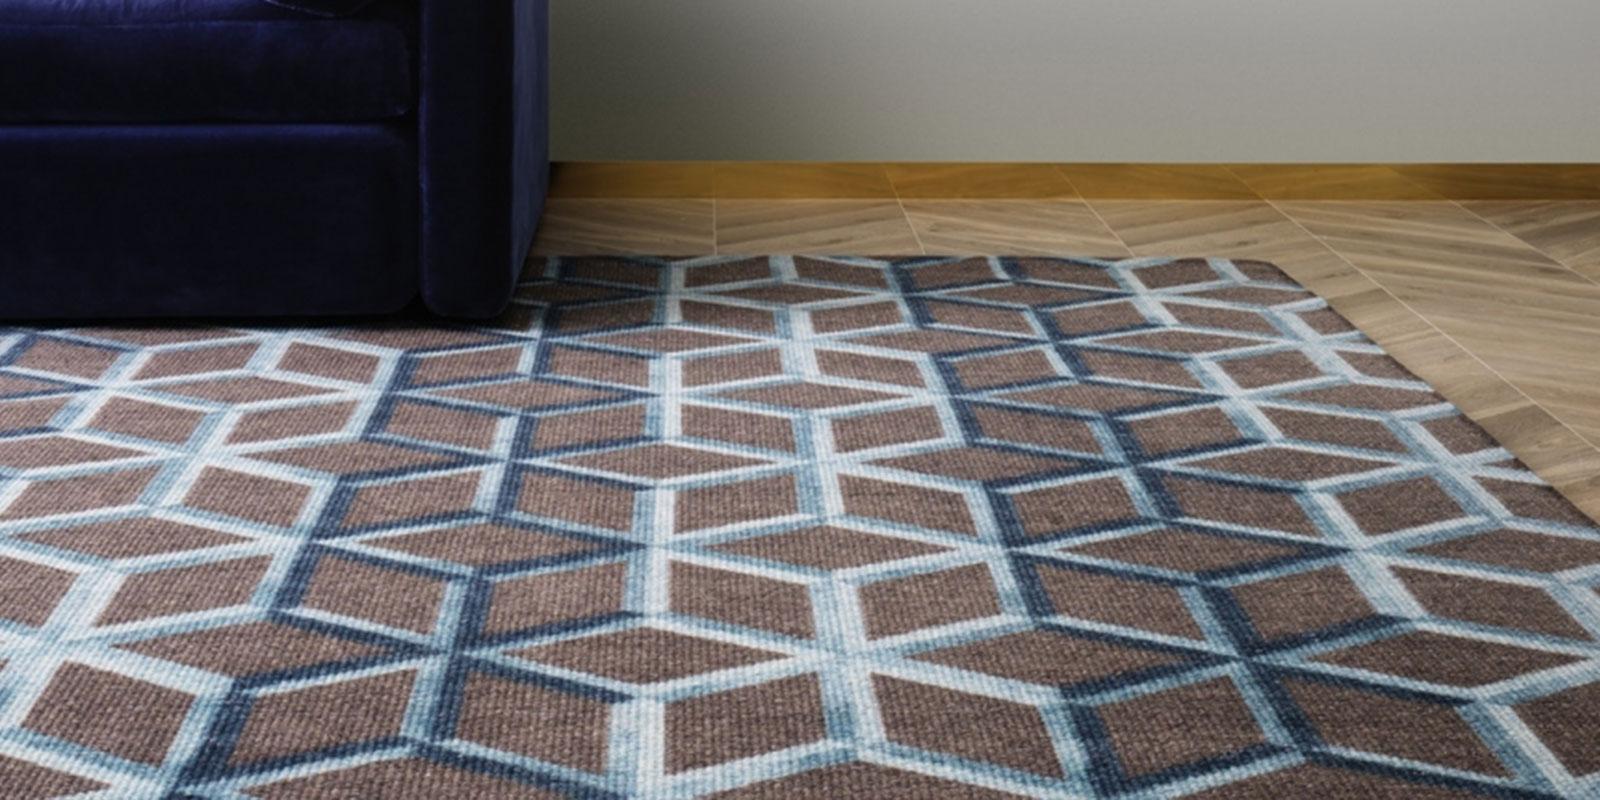 Tappeti moderni: restauro, vendita e custodia di tappeti moderni e ...